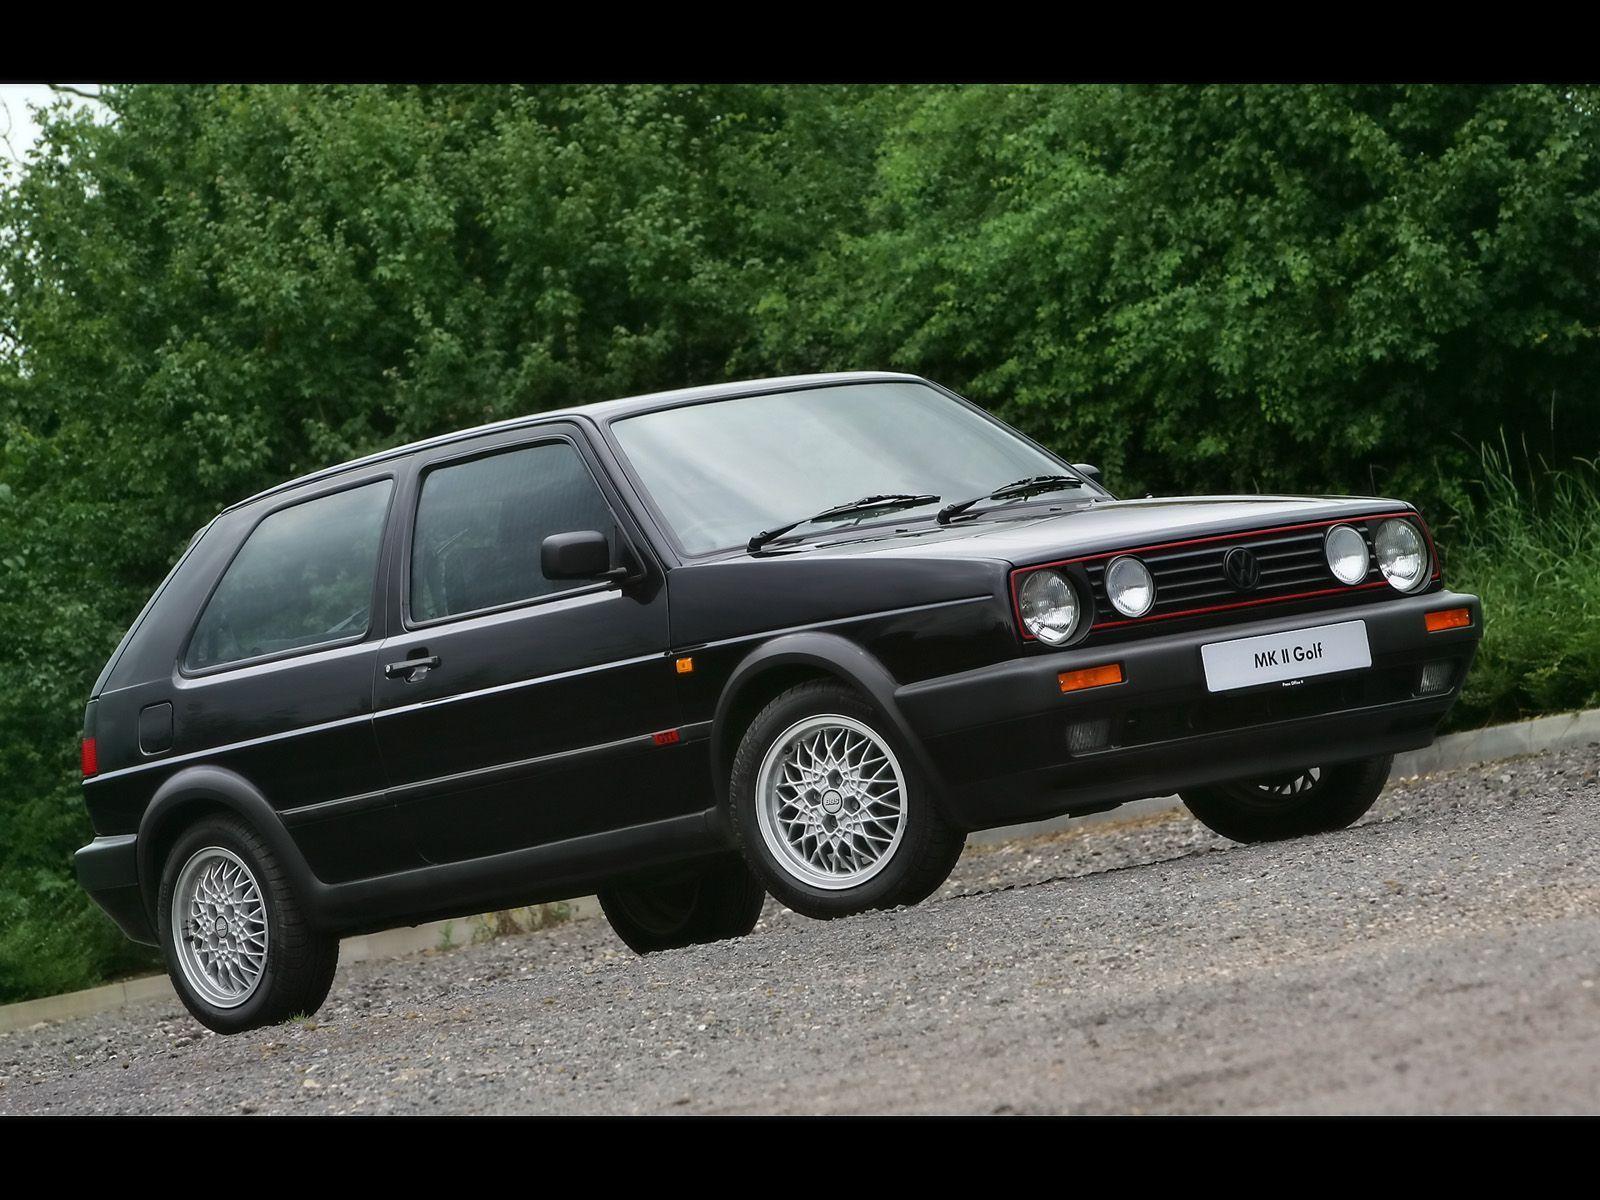 Volkswagen Golf GTI History 1984 1992 Mk II 1600x1200